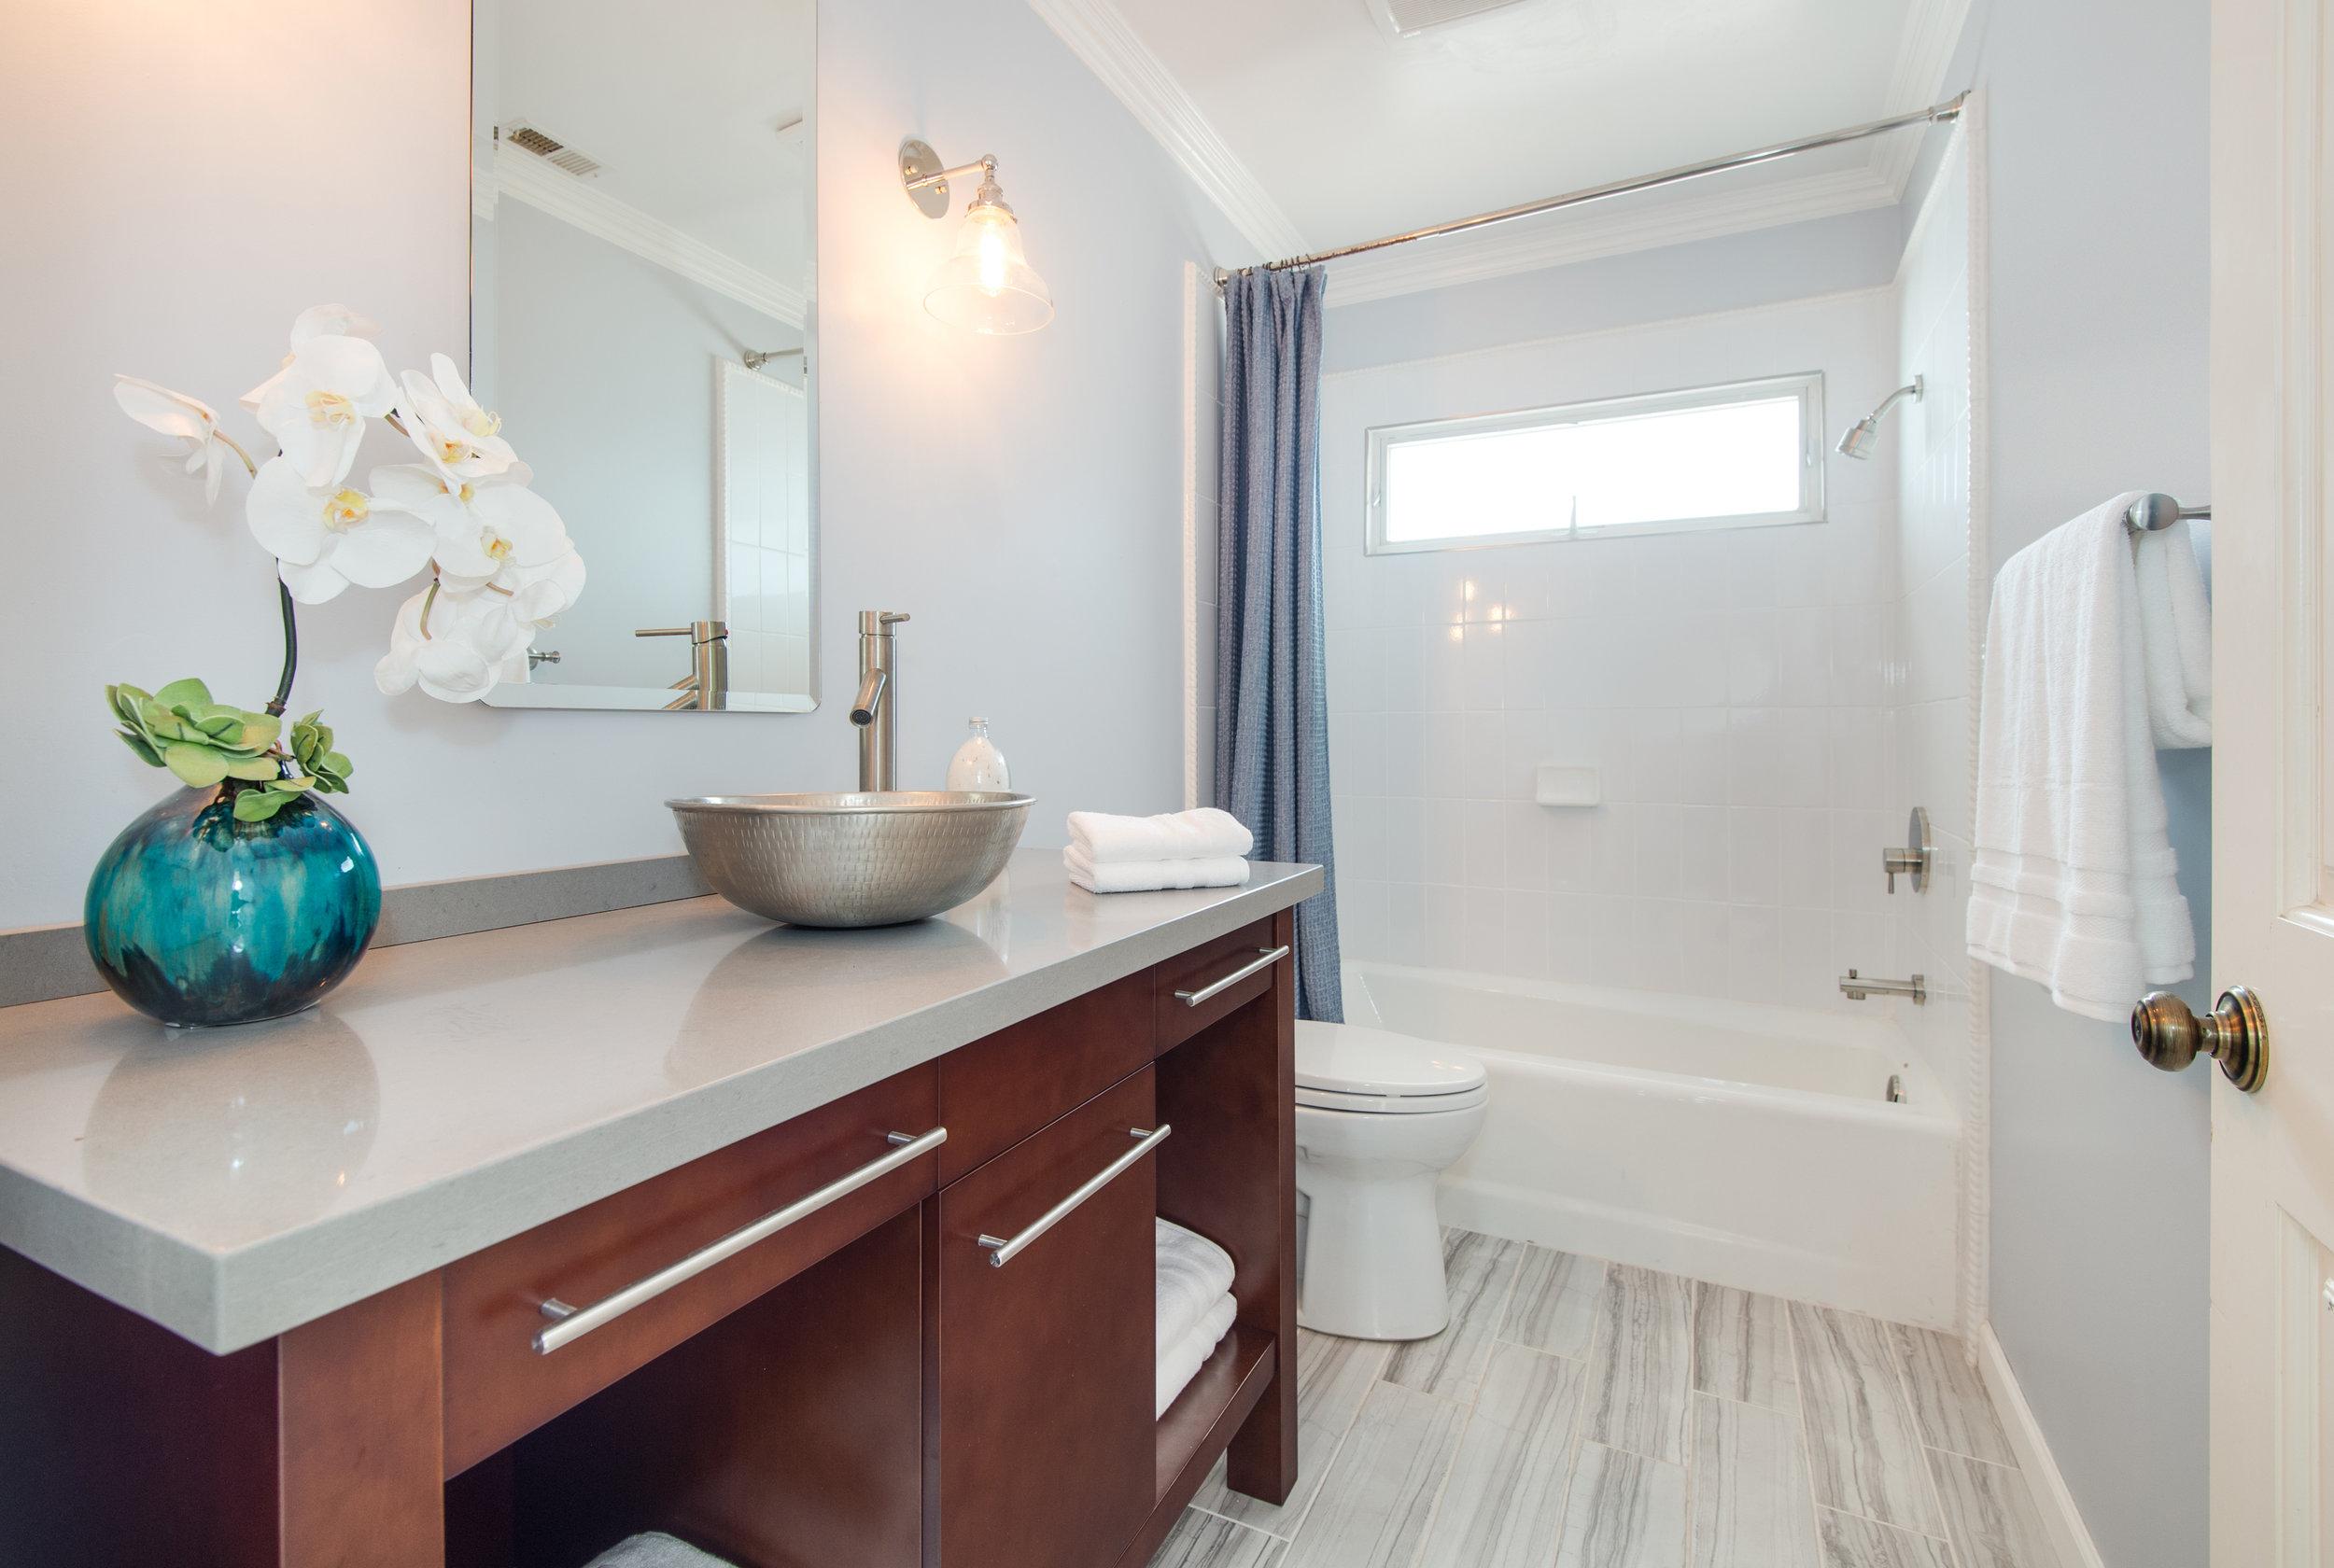 021 Bathroom 25342 Malibu Road For Sale Lease The Malibu Life Team Luxury Real Estate.jpg